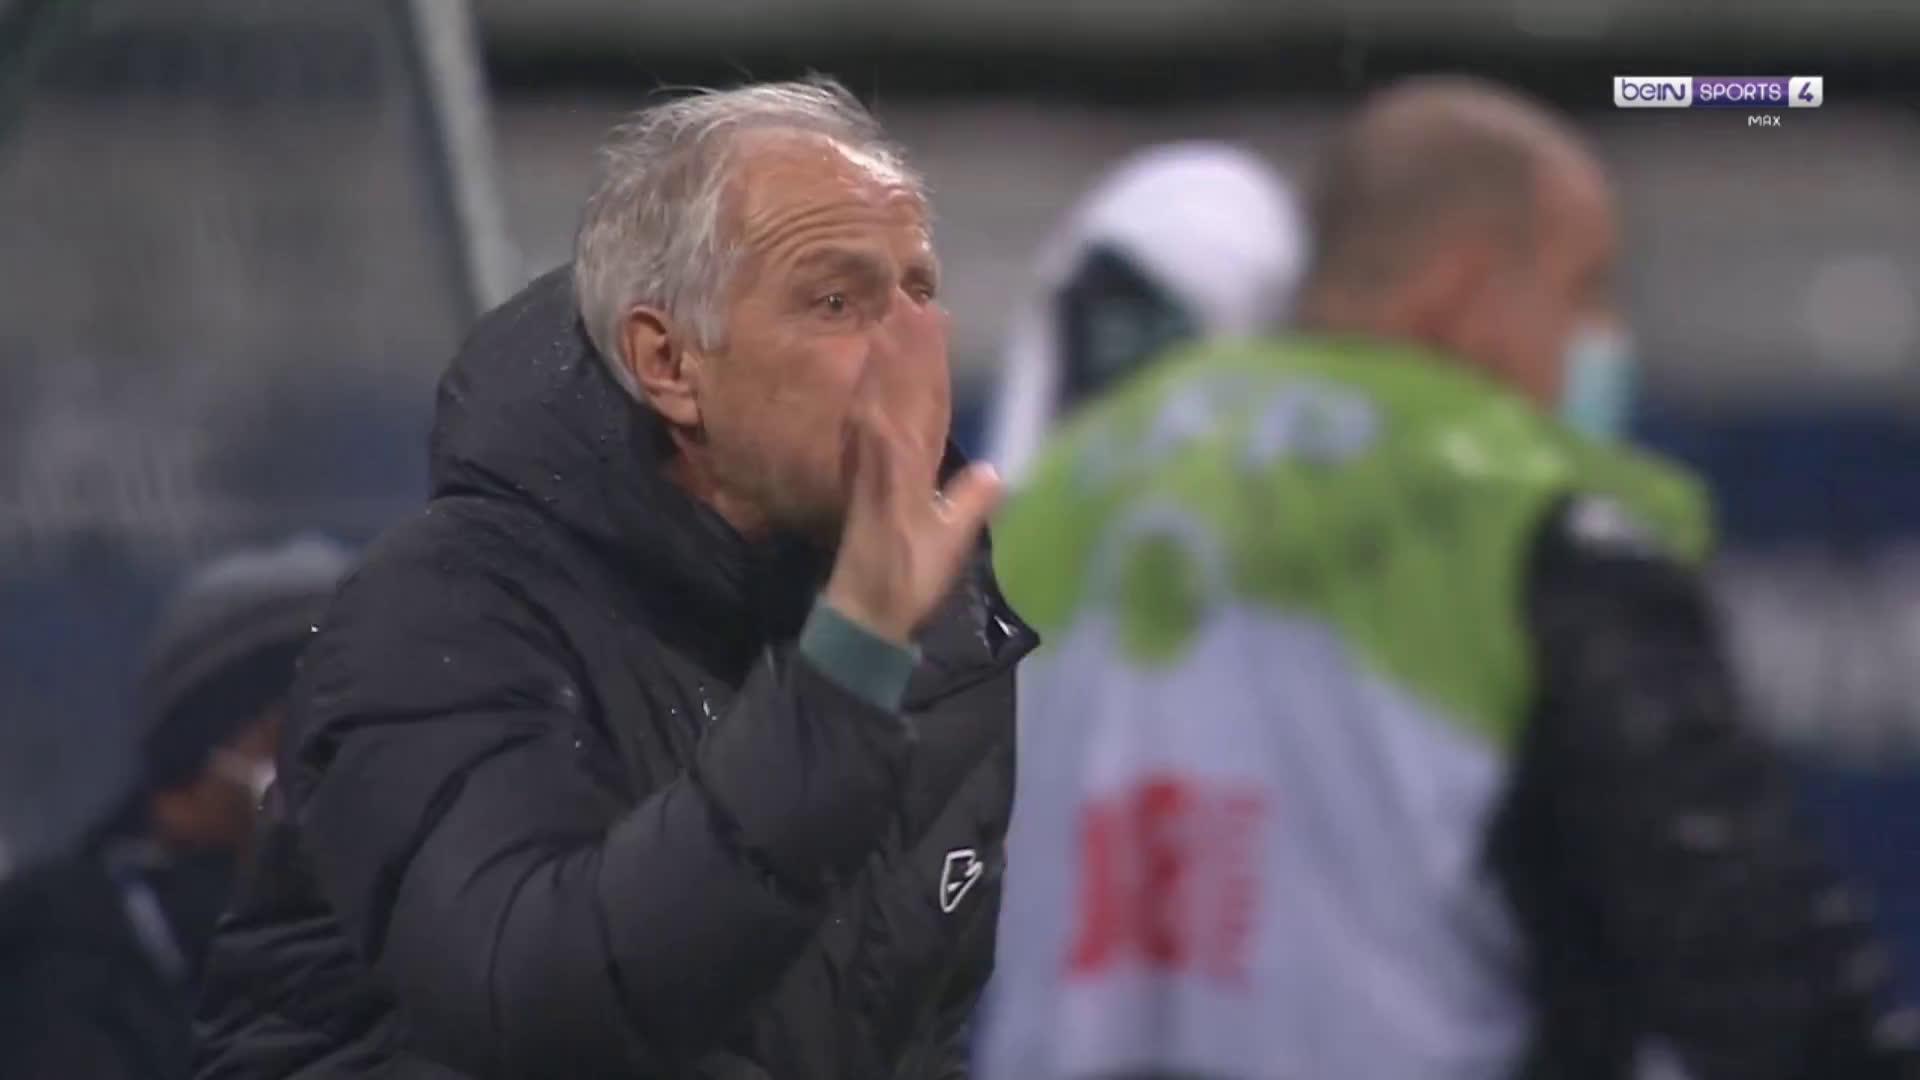 Paris FC [3]-2 EA Guingamp - Moustapha Name 90+1' Great Goal